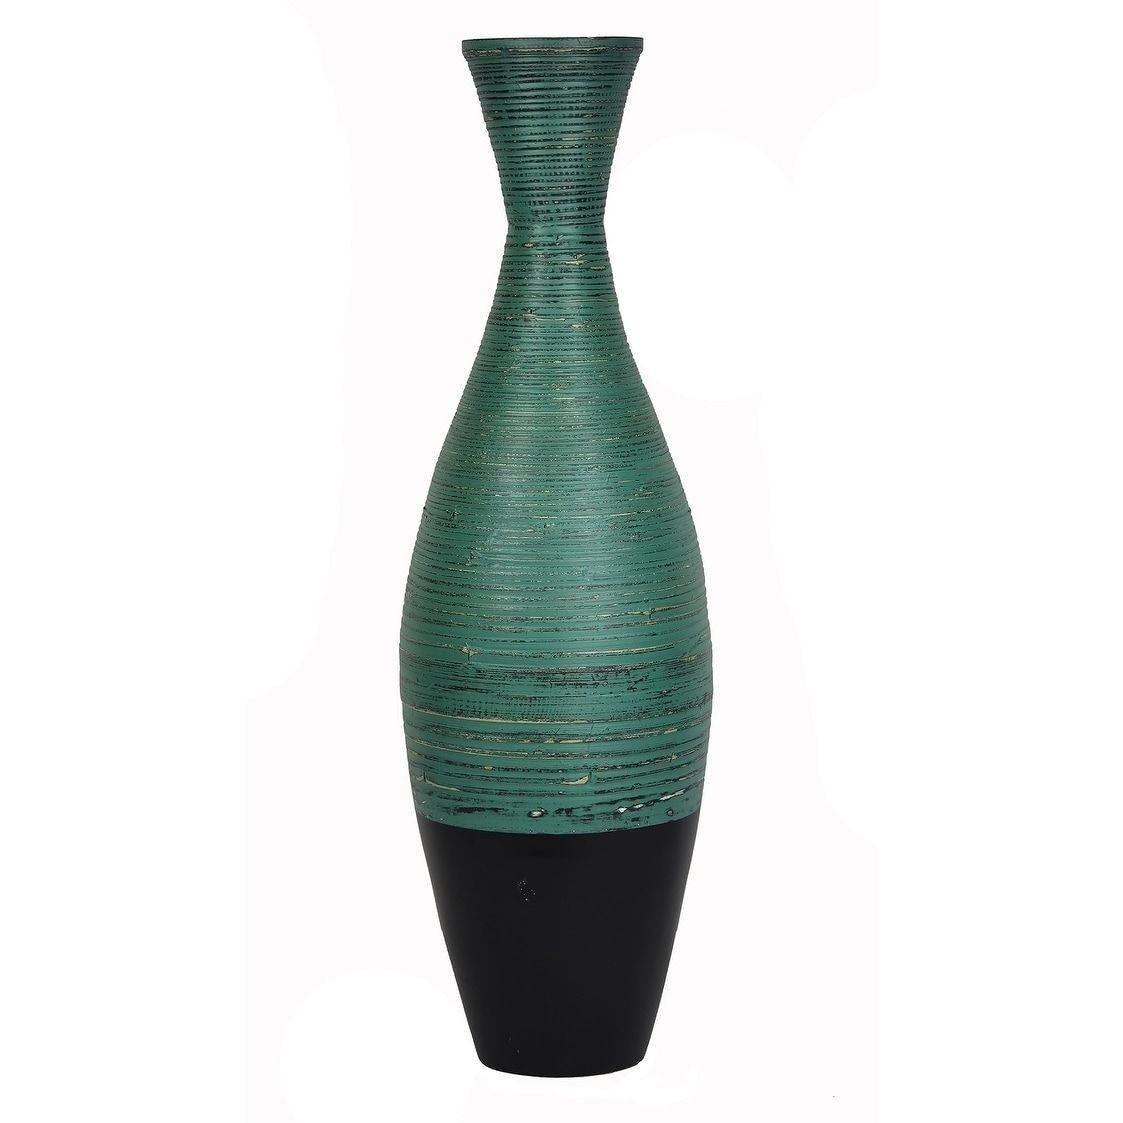 black ceramic floor vase of nola 36 spun bamboo floor vase products pinterest outlet for nola 36 spun bamboo floor vase